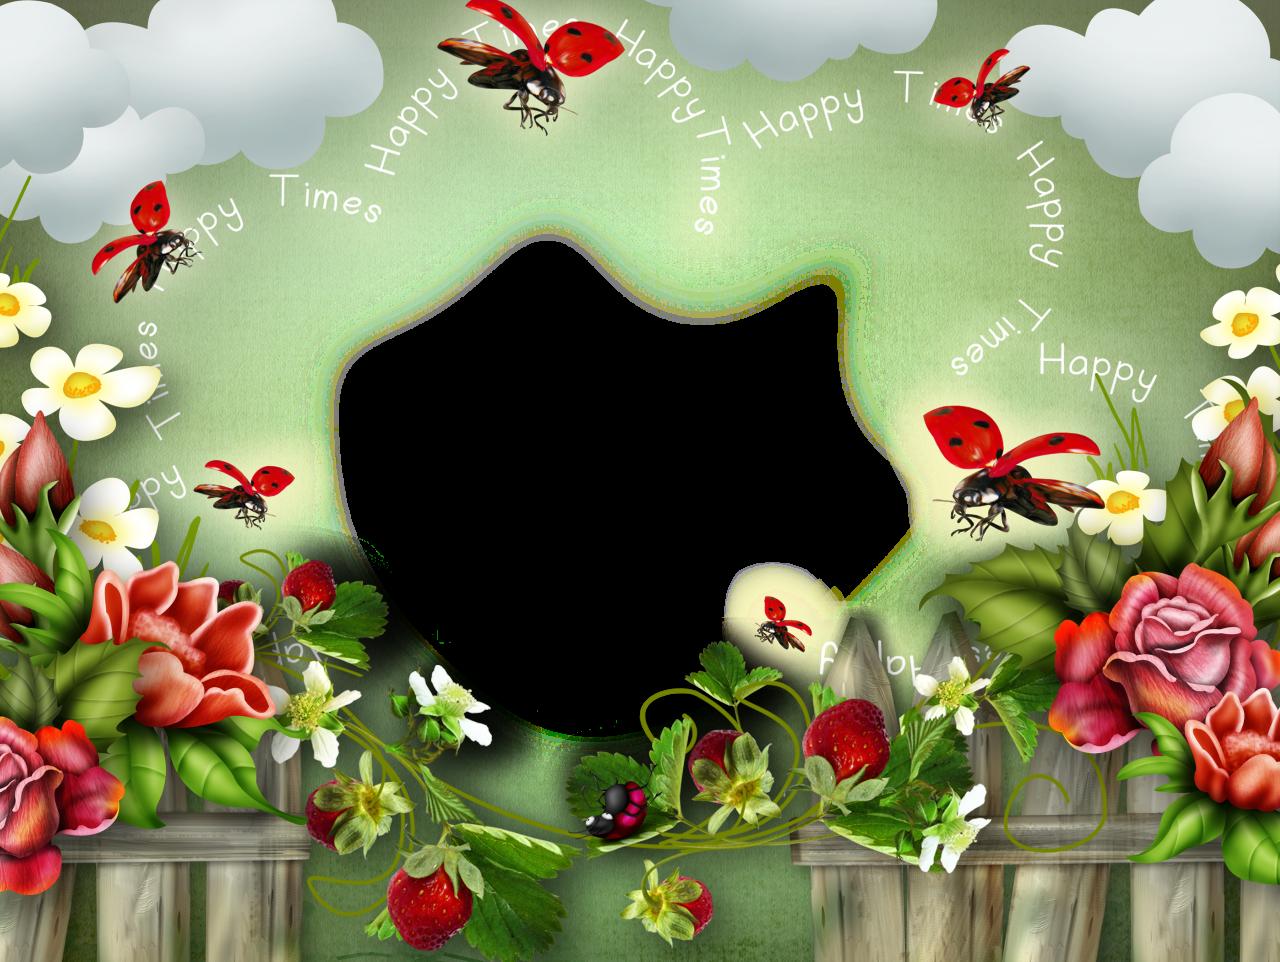 http://img-fotki.yandex.ru/get/5641/41771327.36a/0_896b5_dde40f1_orig.png